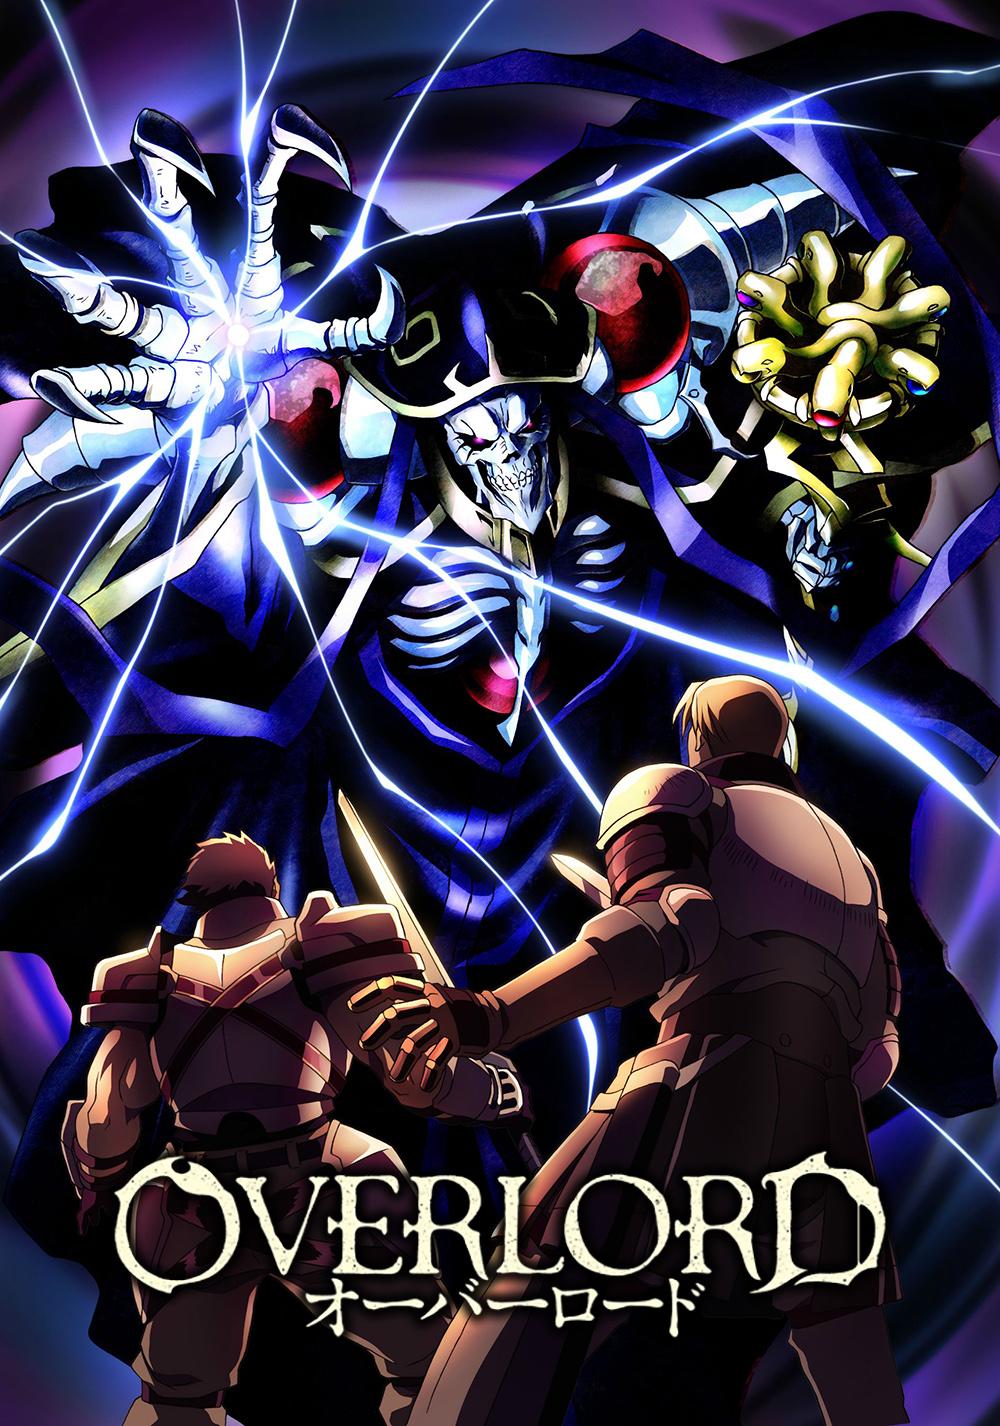 Overlord Anime | Wikia Overlord | Fandom